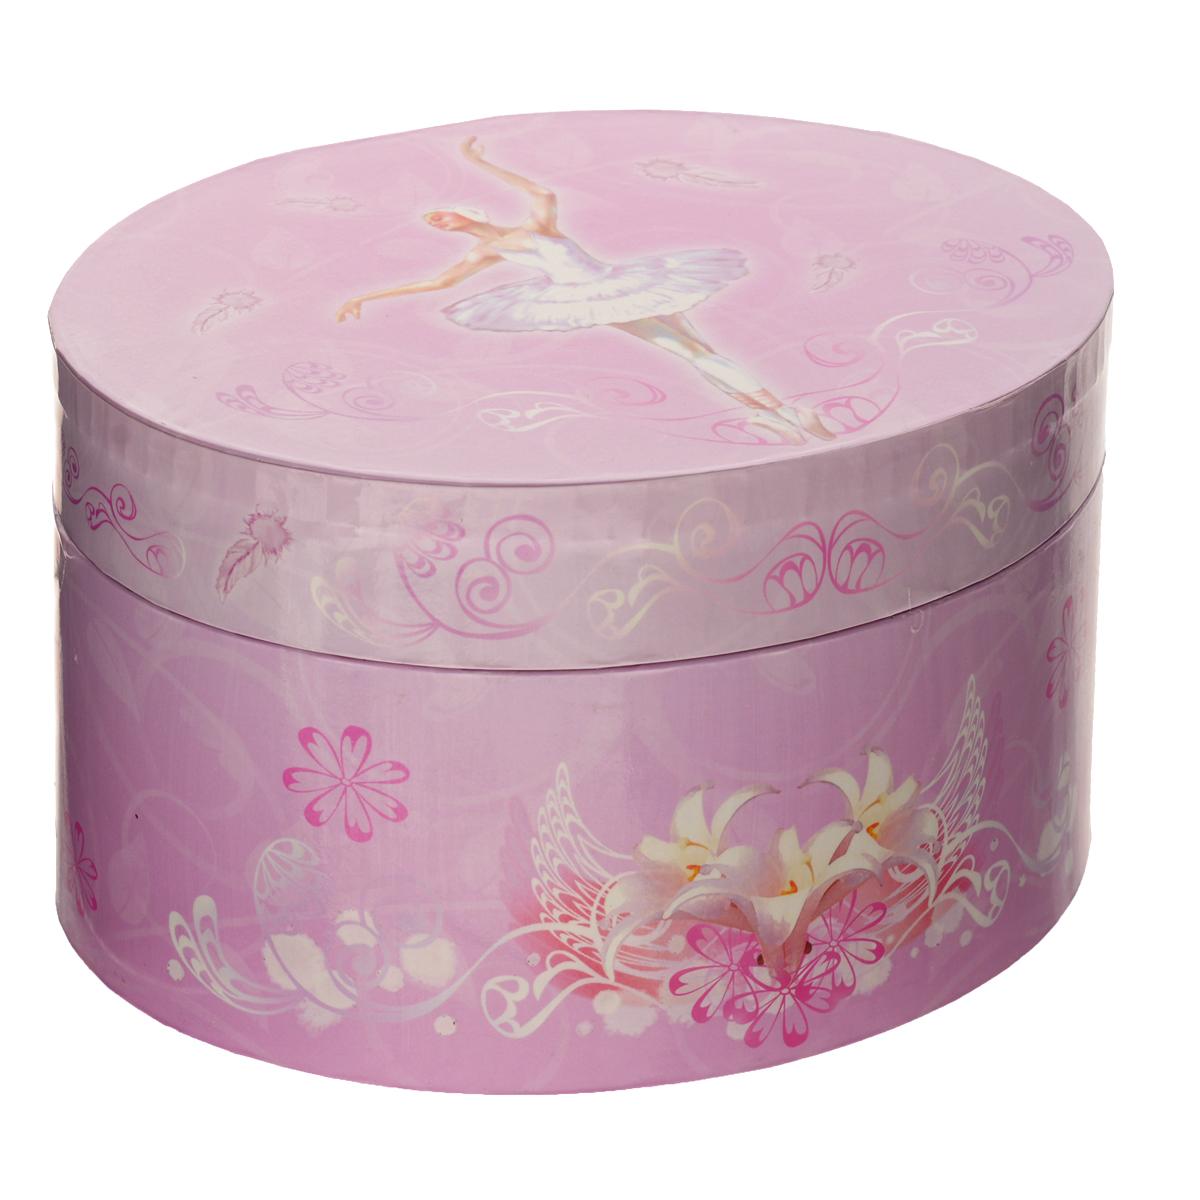 "Музыкальная шкатулка Jakos ""Балерина"", цвет: розовый 615000балерина"